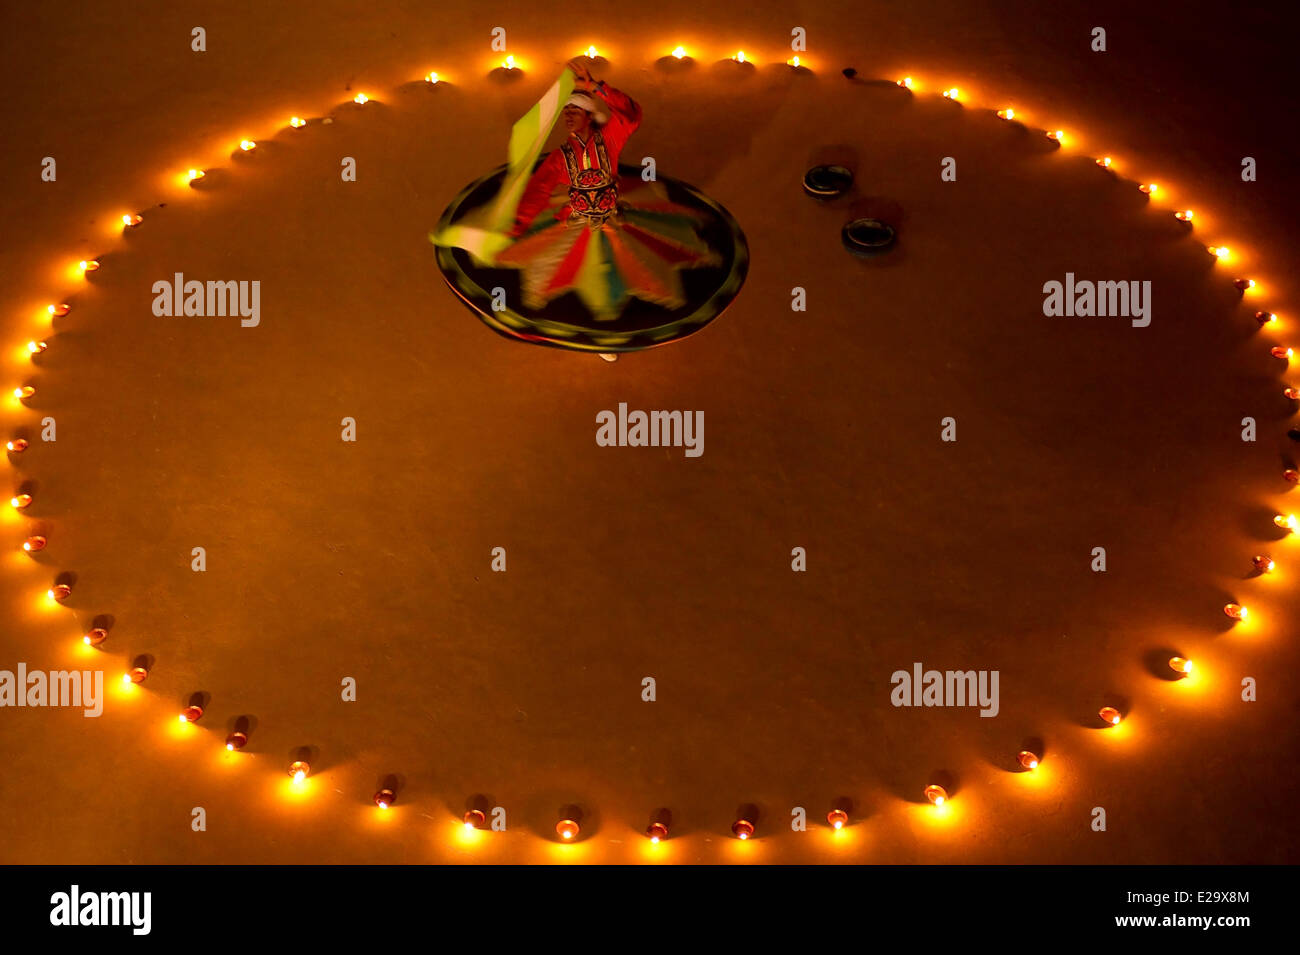 India, Rajasthan state, Nagaur, sufi festival - Stock Image